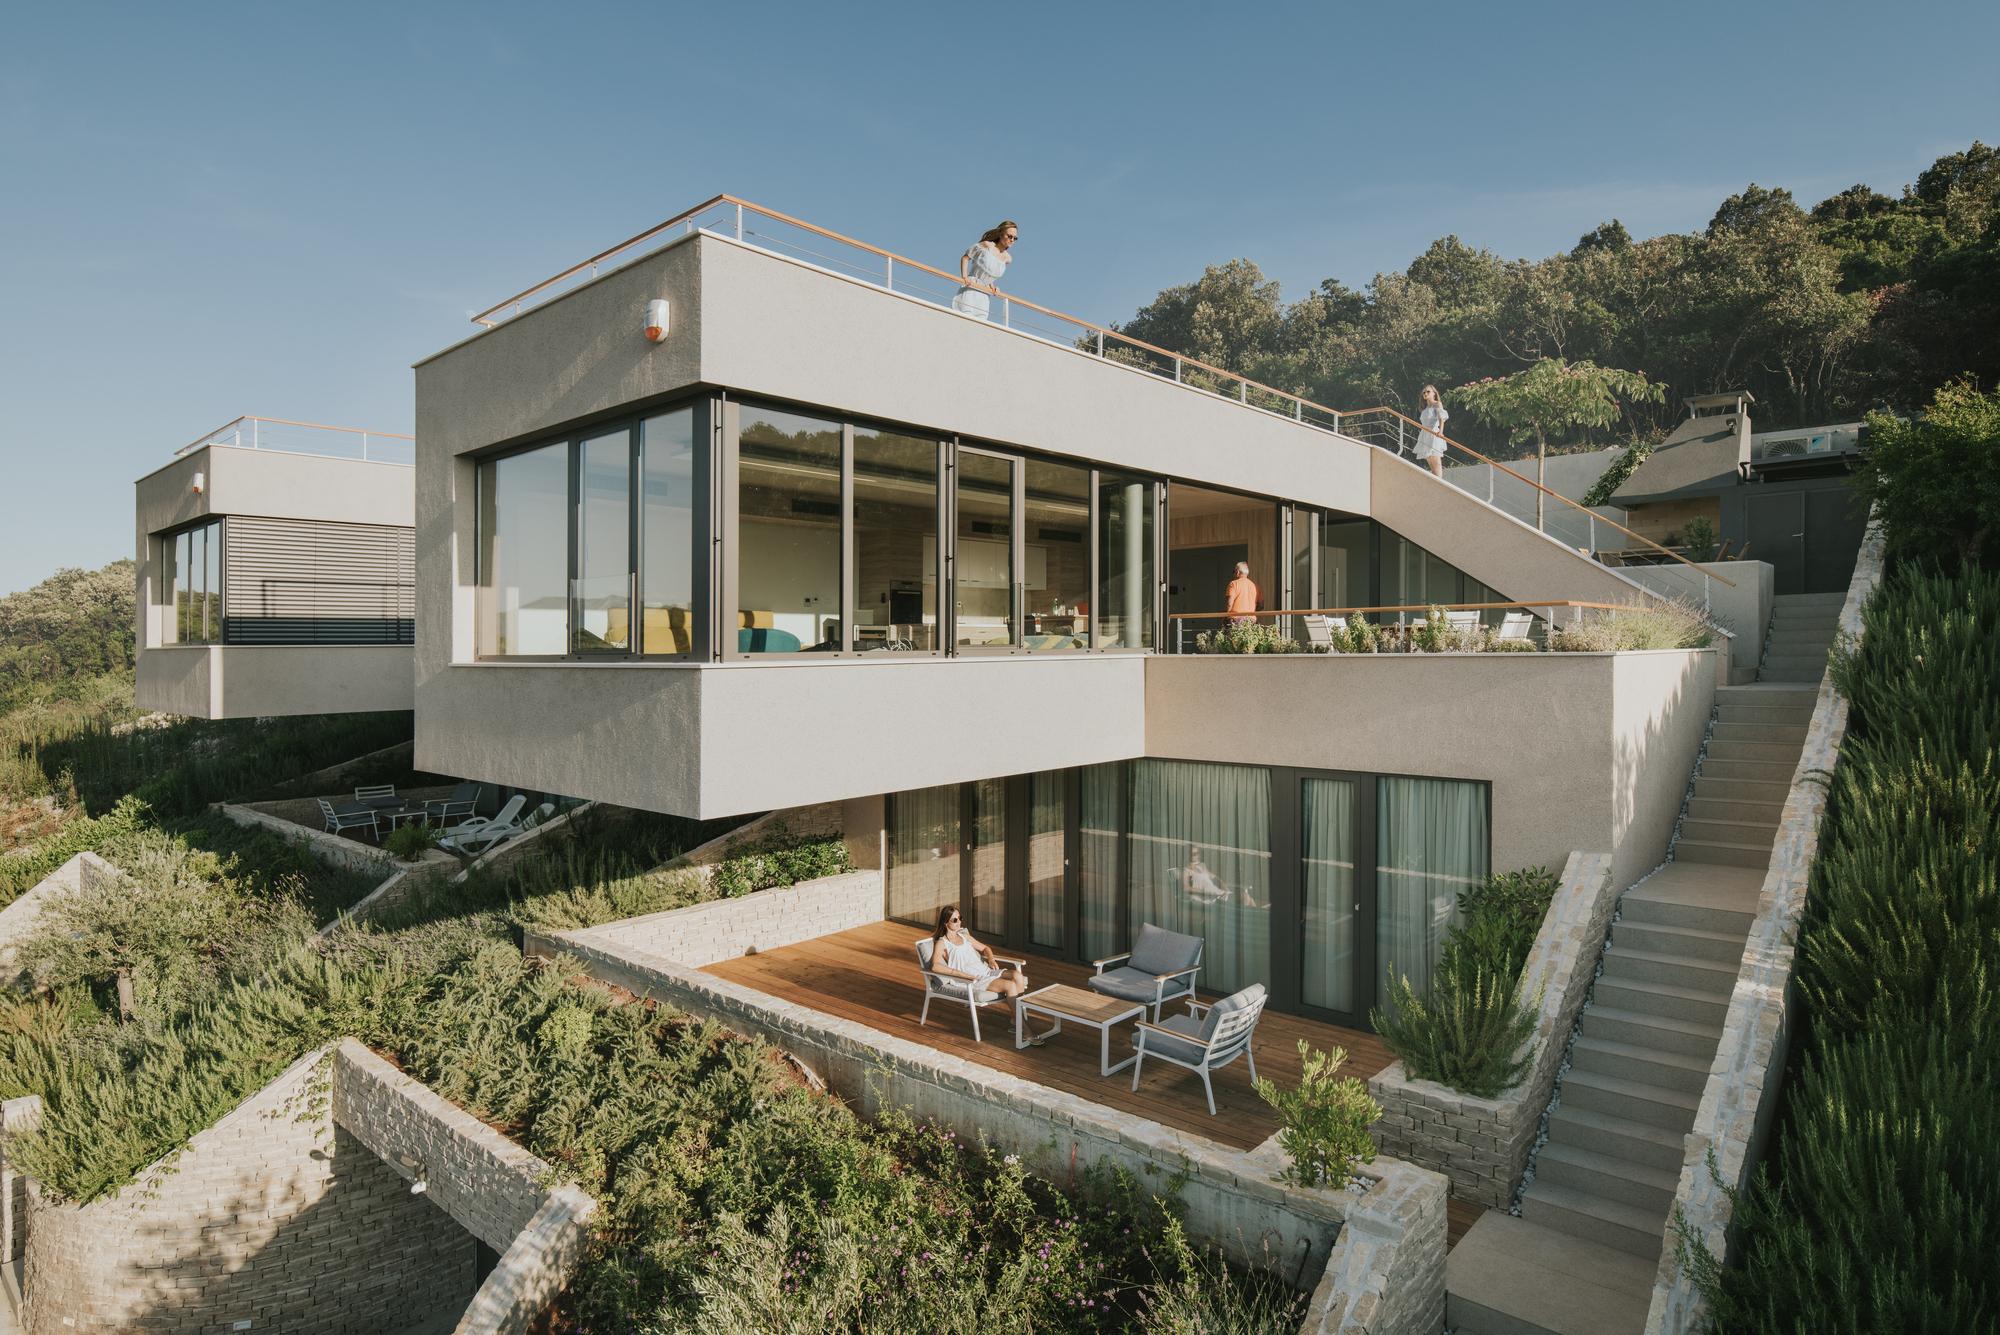 Tinel Vacation Houses / SODAarhitekti